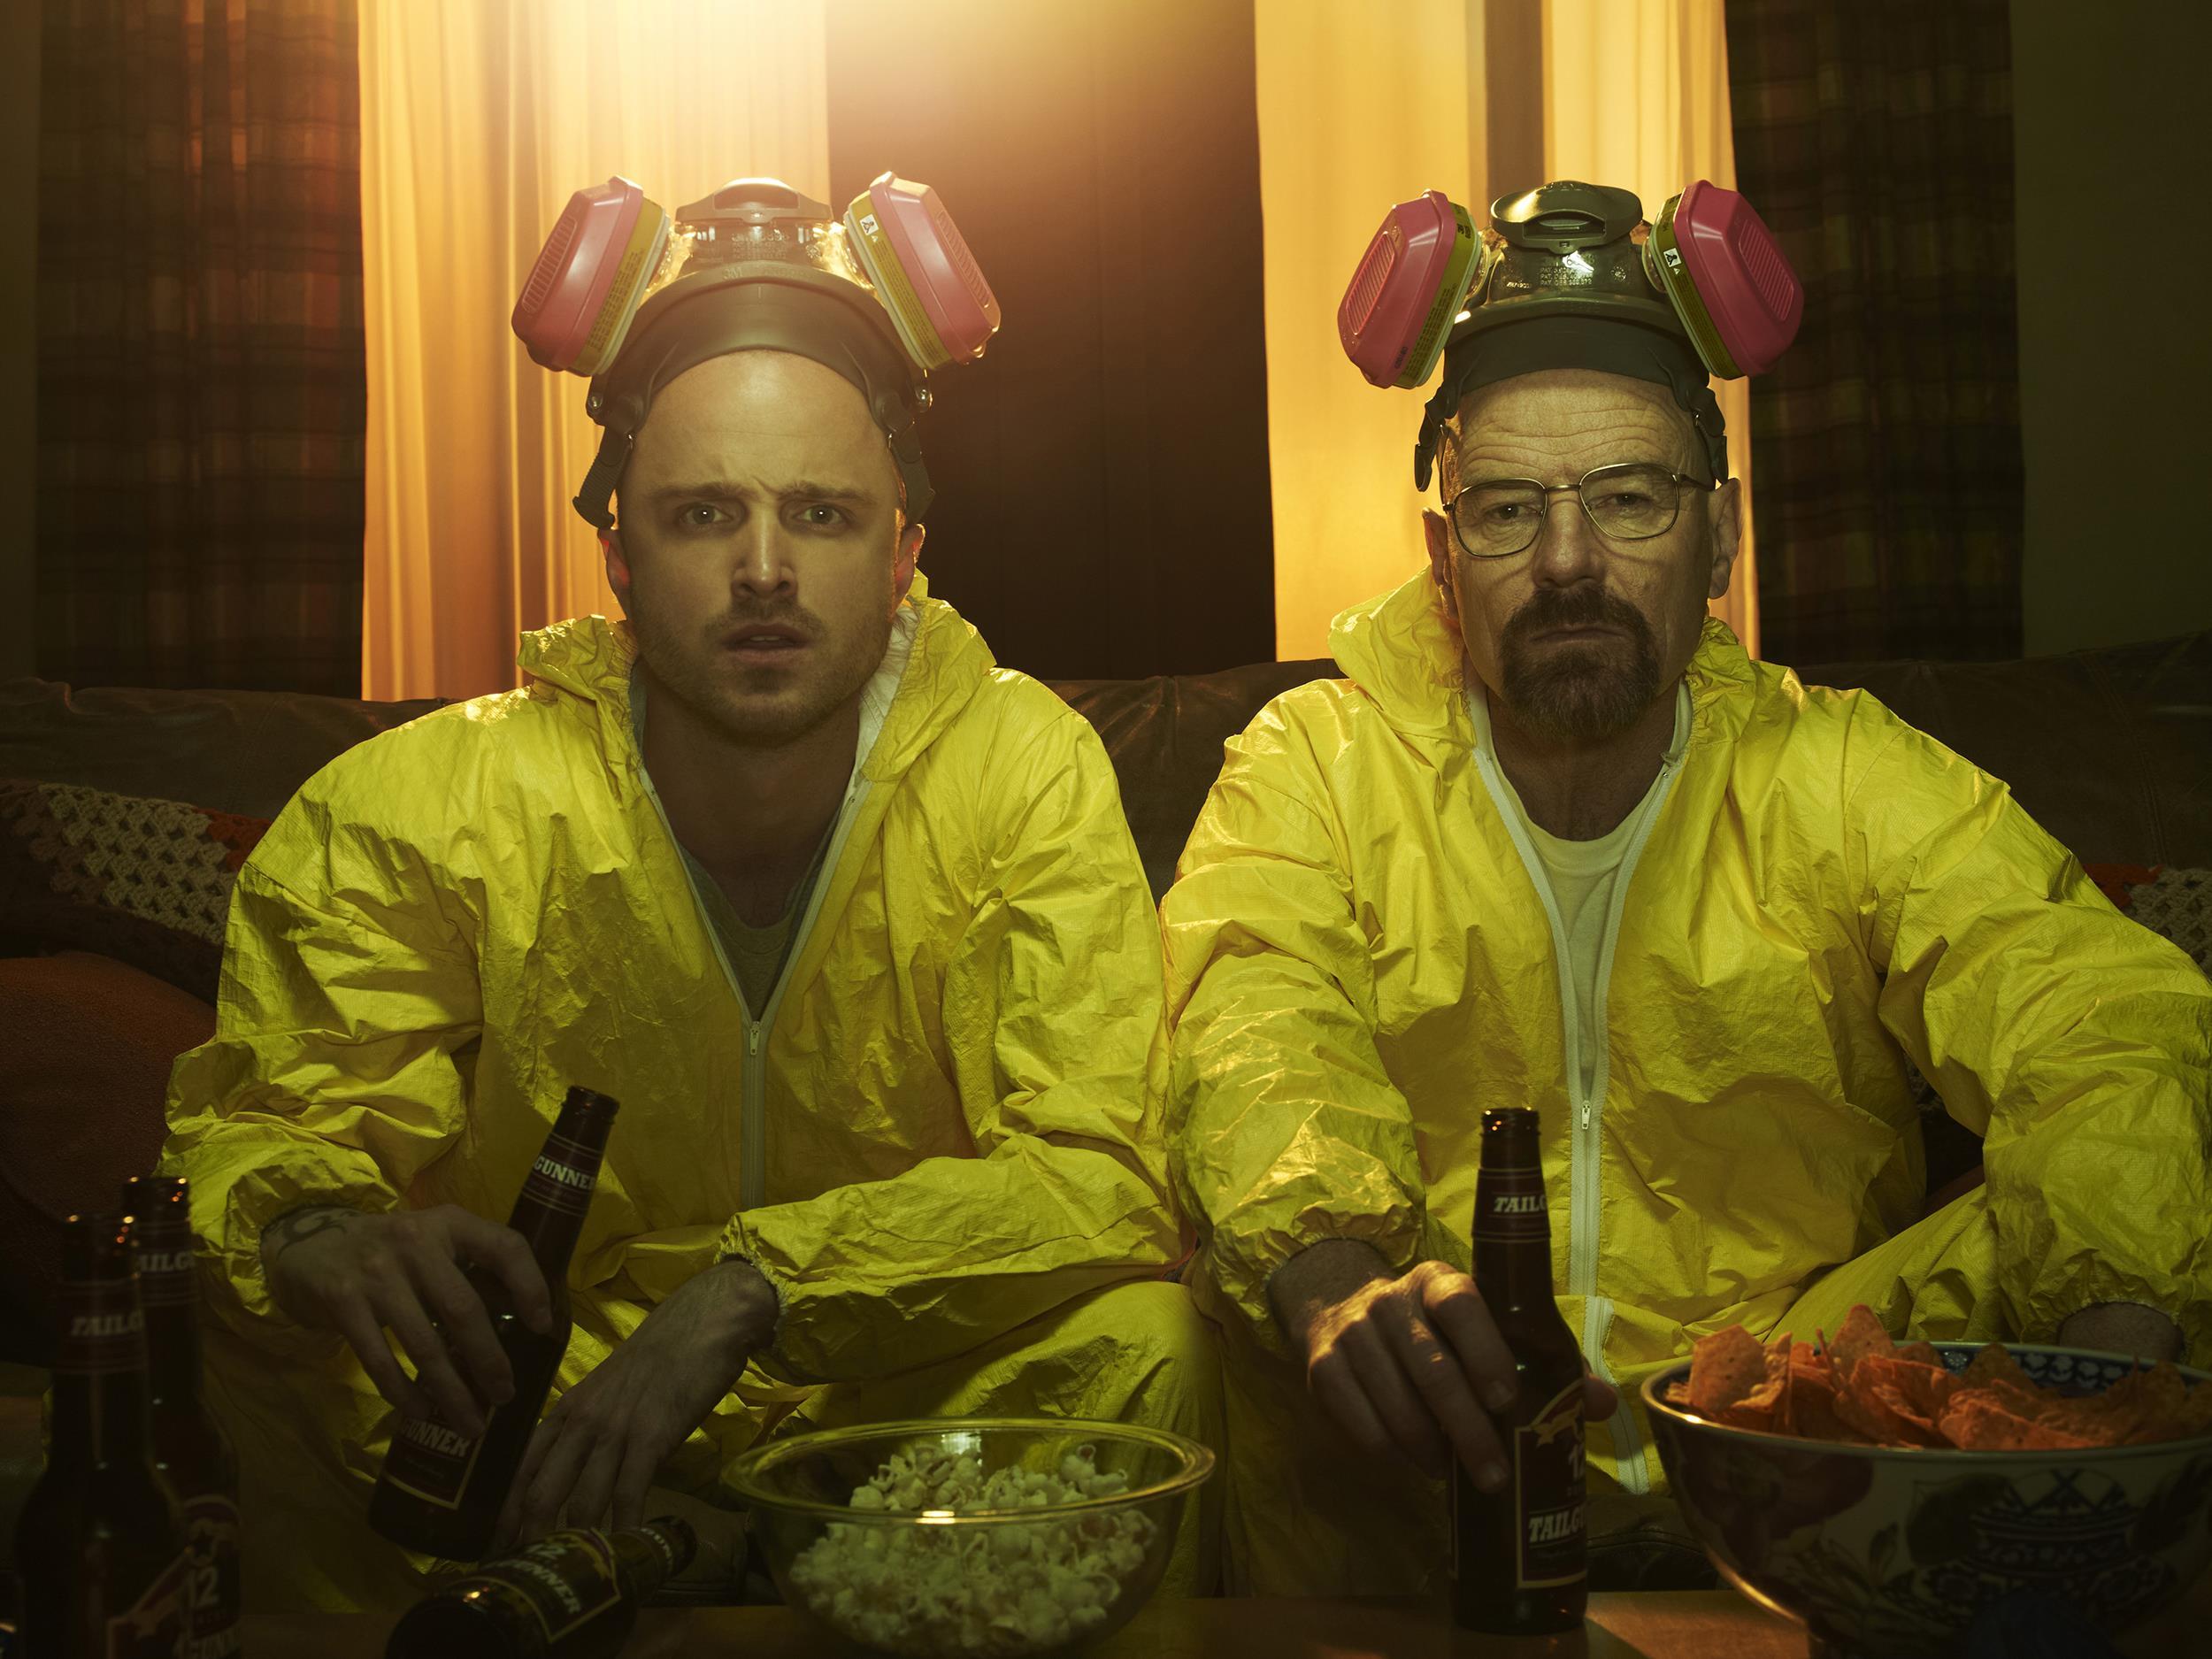 Image: Jesse Pinkman (Aaron Paul) and Walter White (Bryan Cranston) in Breaking Bad.